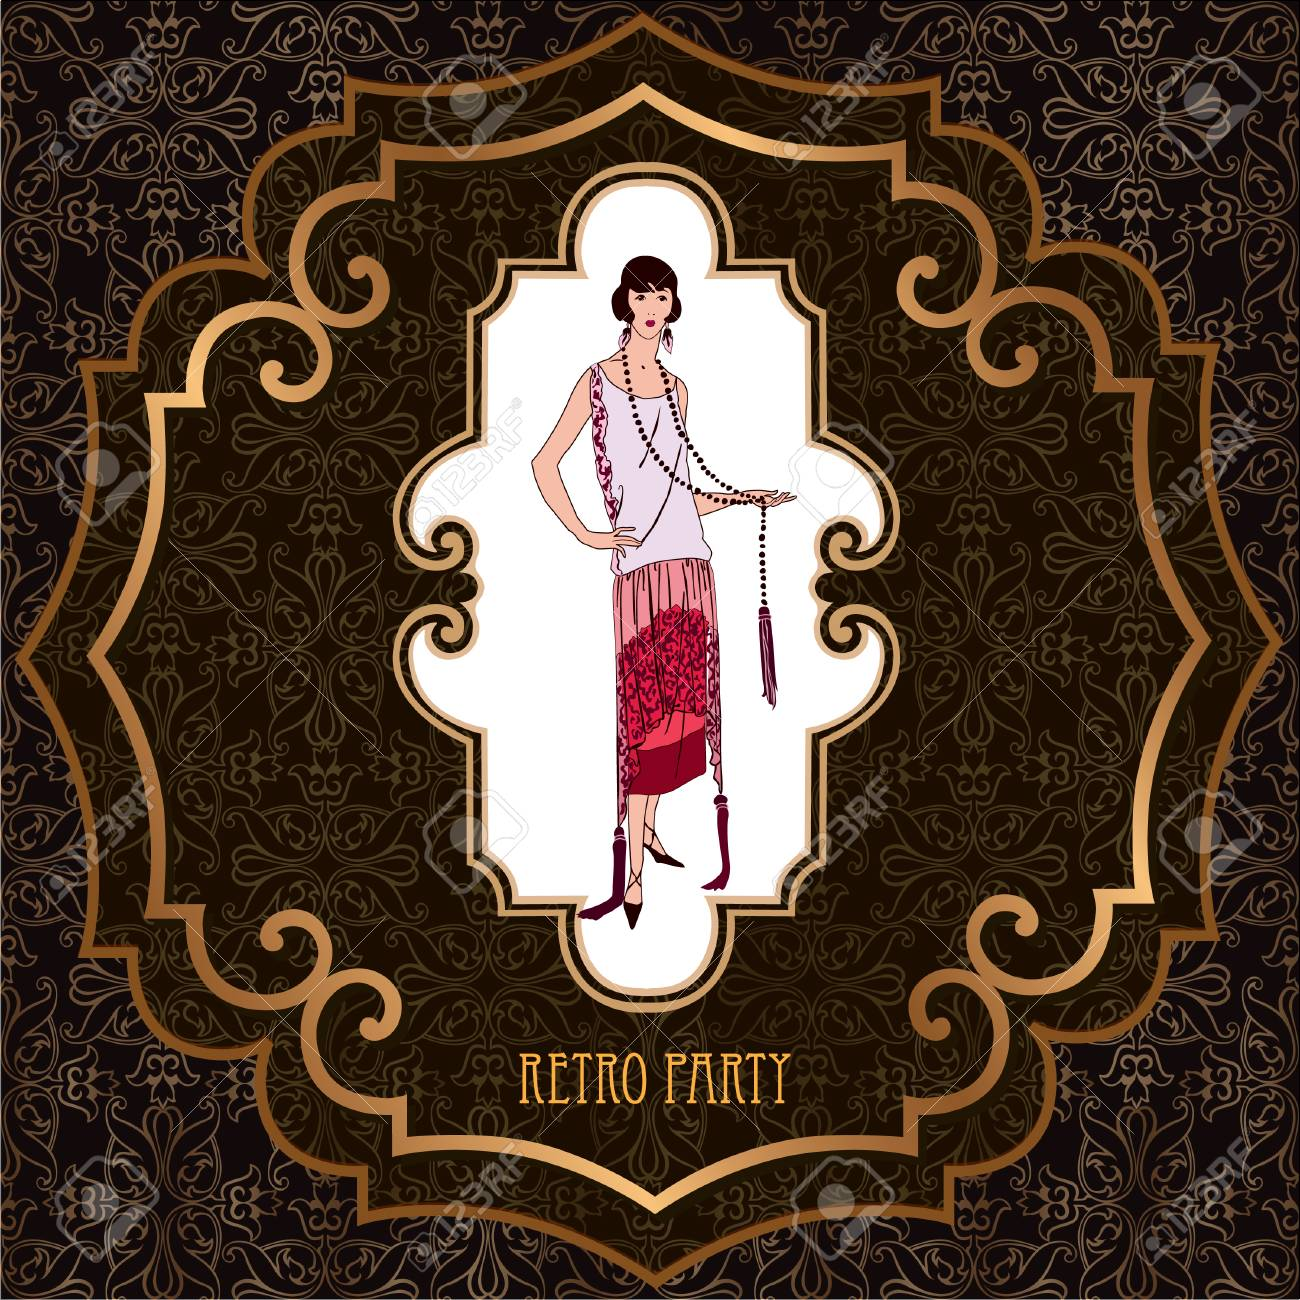 Retro Party Invitation Design Flapper Girl Over Vintage Background